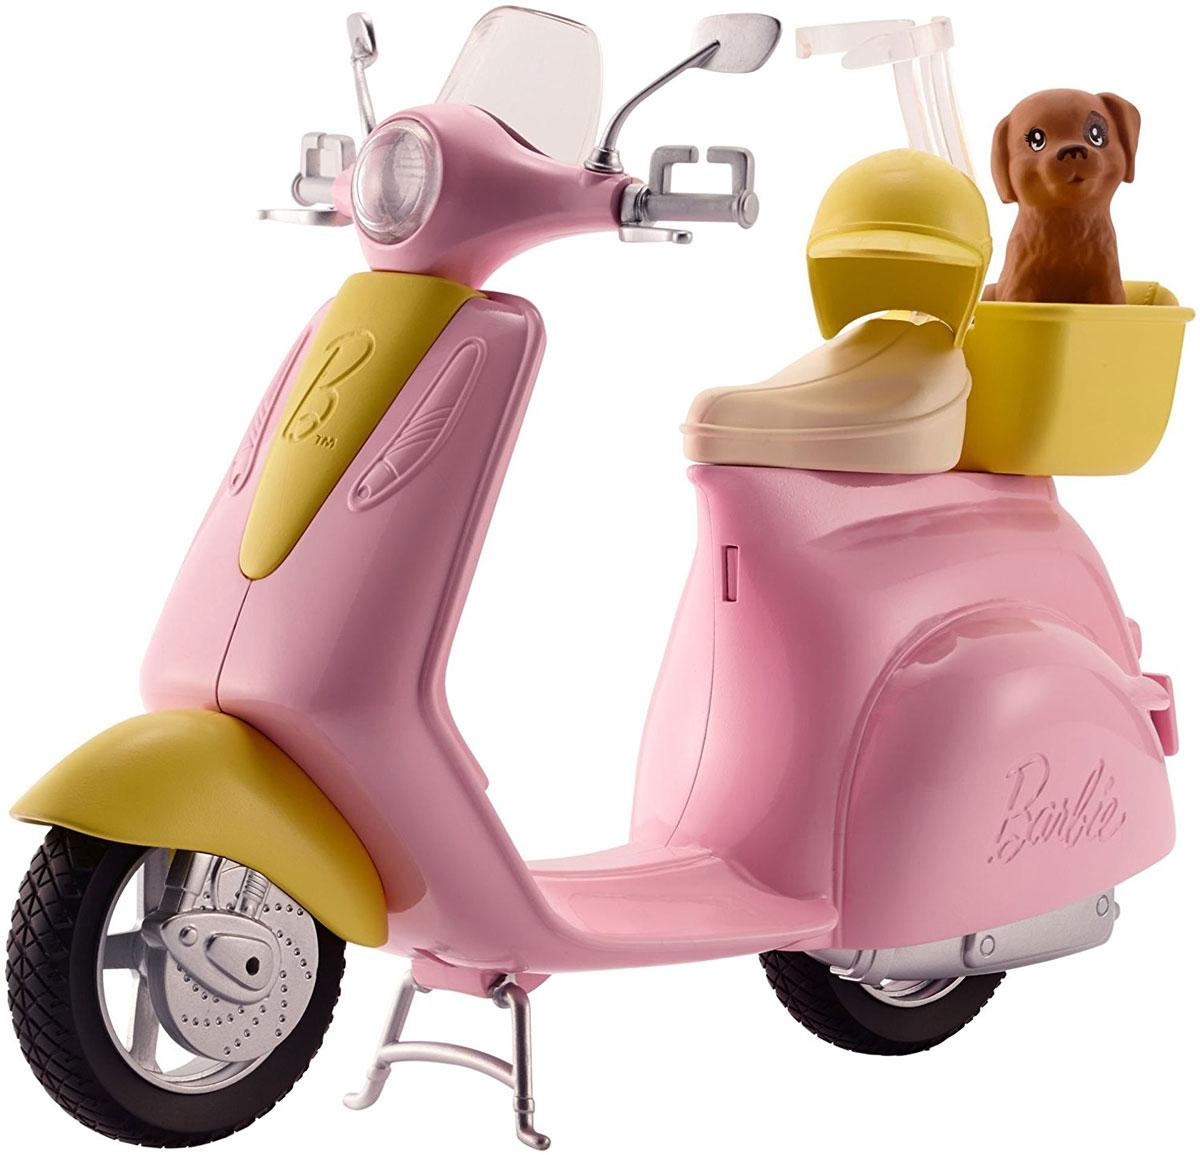 Barbie Мопед для куклы куплю мопед рига в челябинске